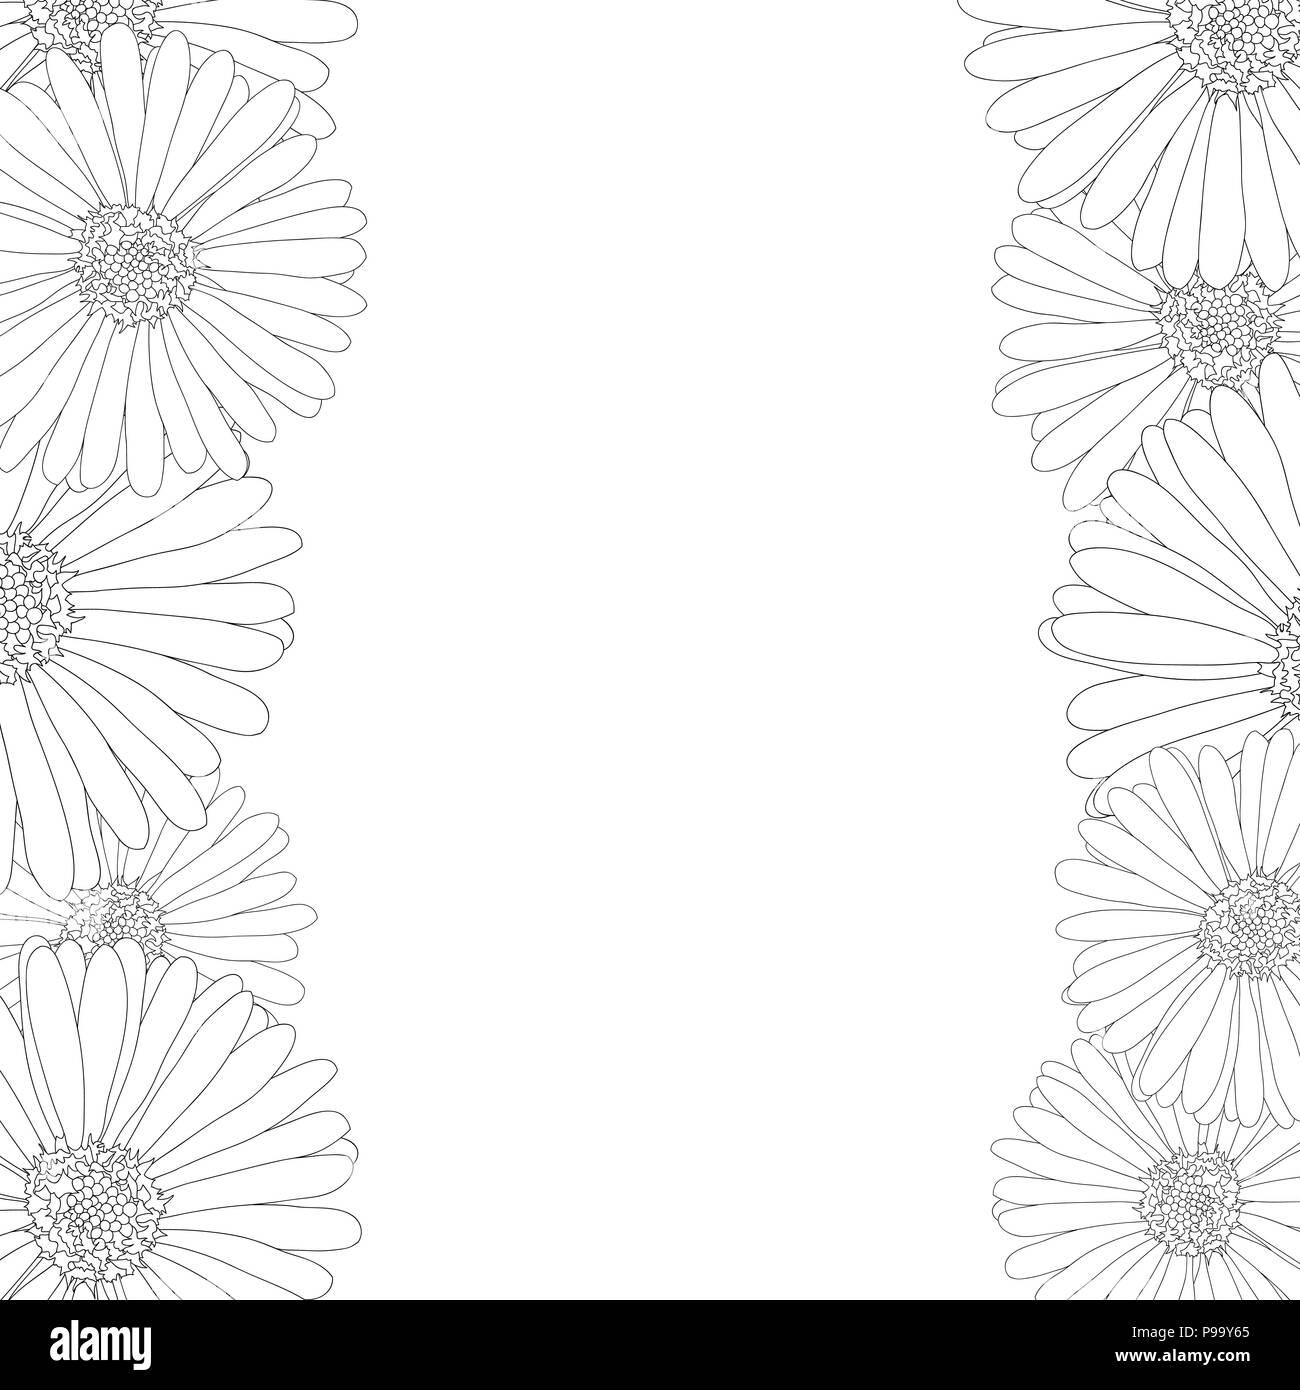 Michaelmas Daisy Black And White Stock Photos Images Alamy